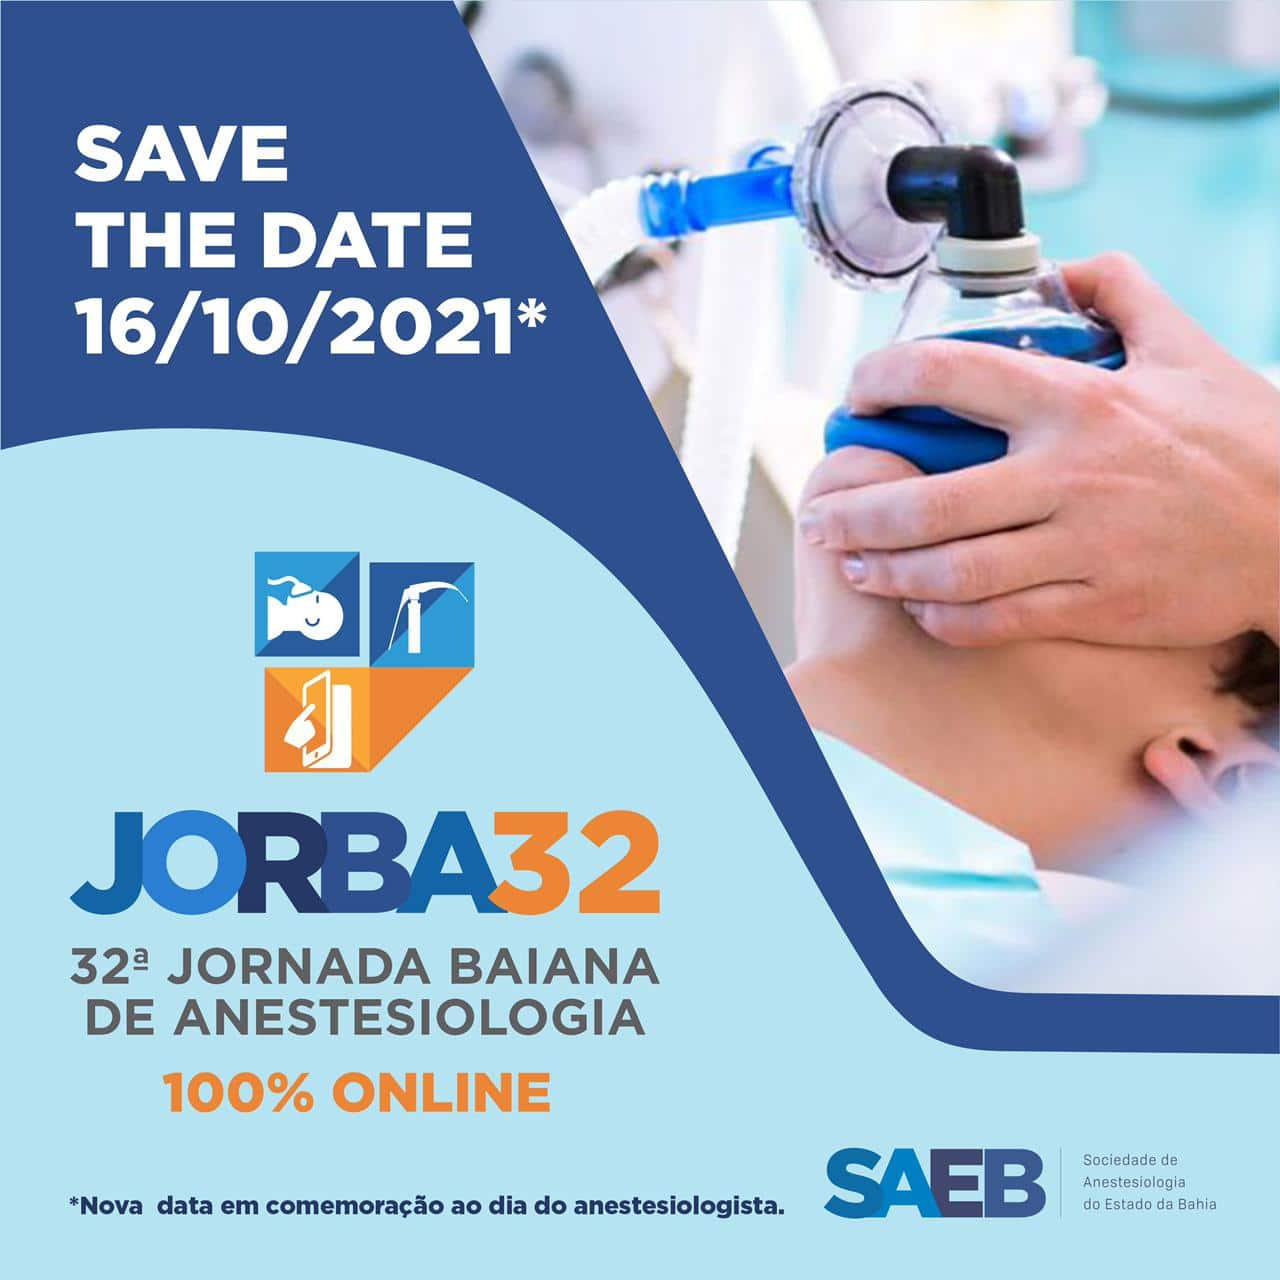 32ª JORBA – Jornada Baiana de Anestesiologia 100% on-line